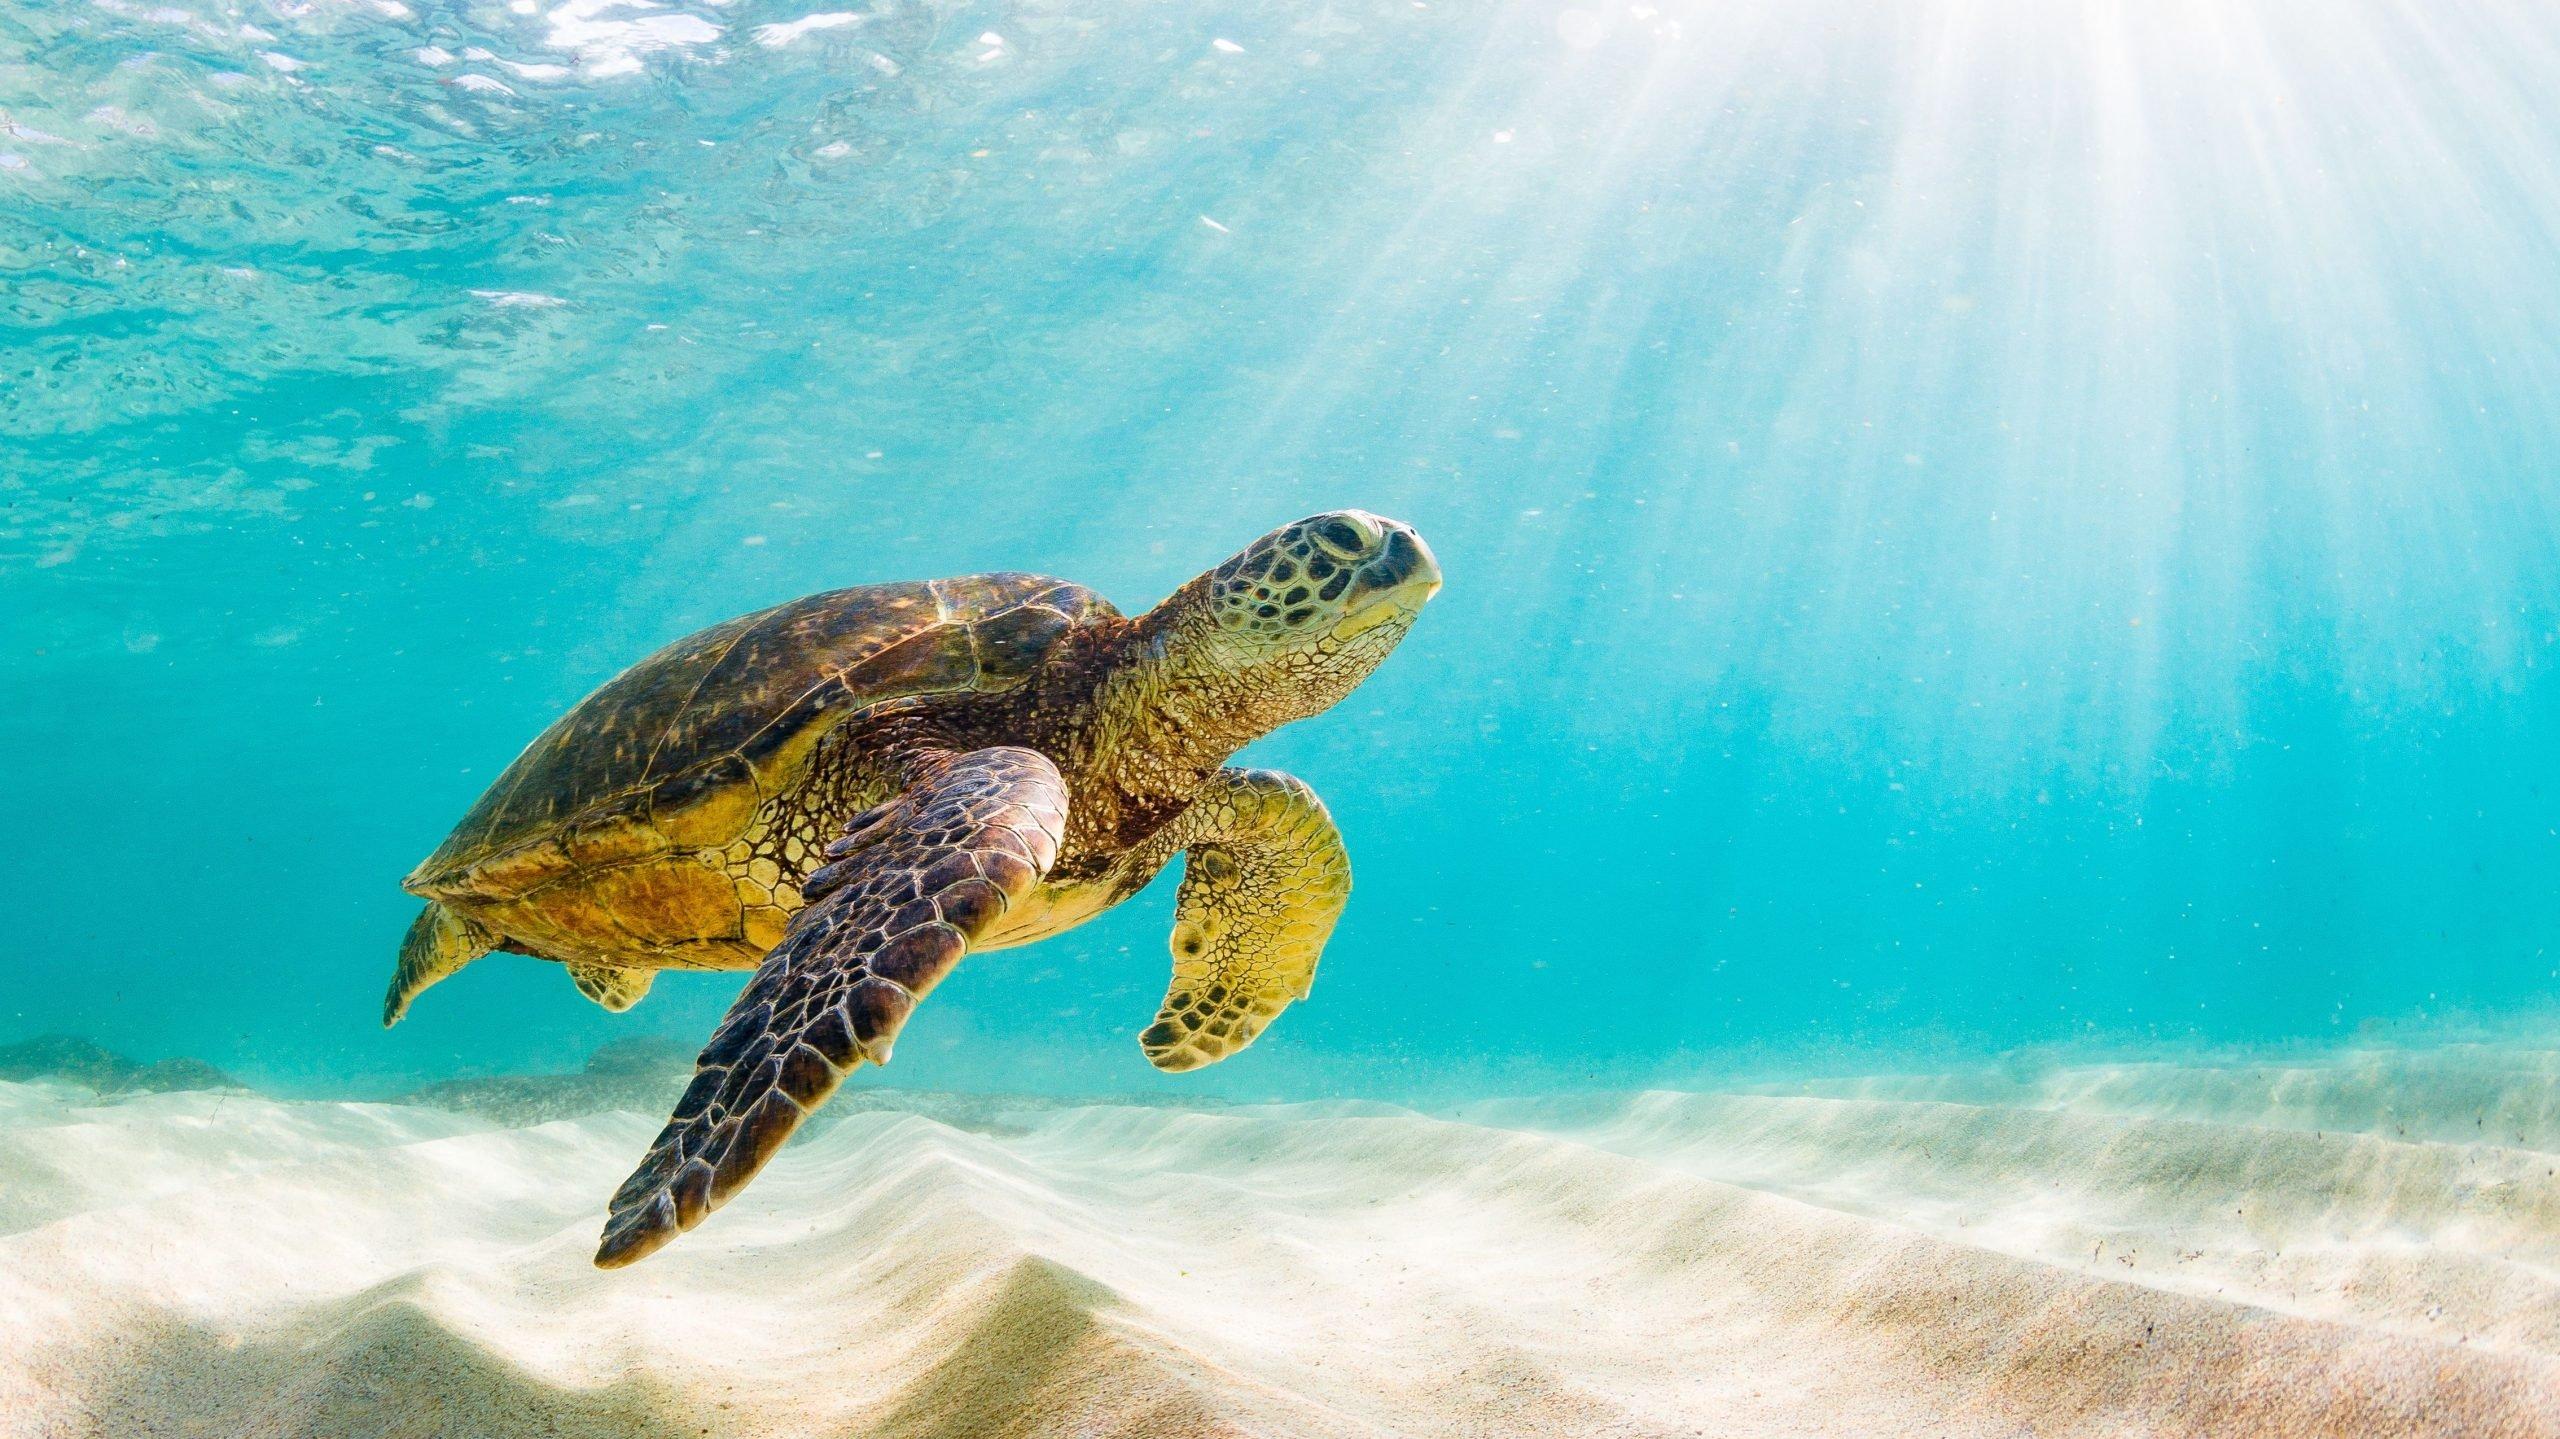 green sea turtle swimming quickly